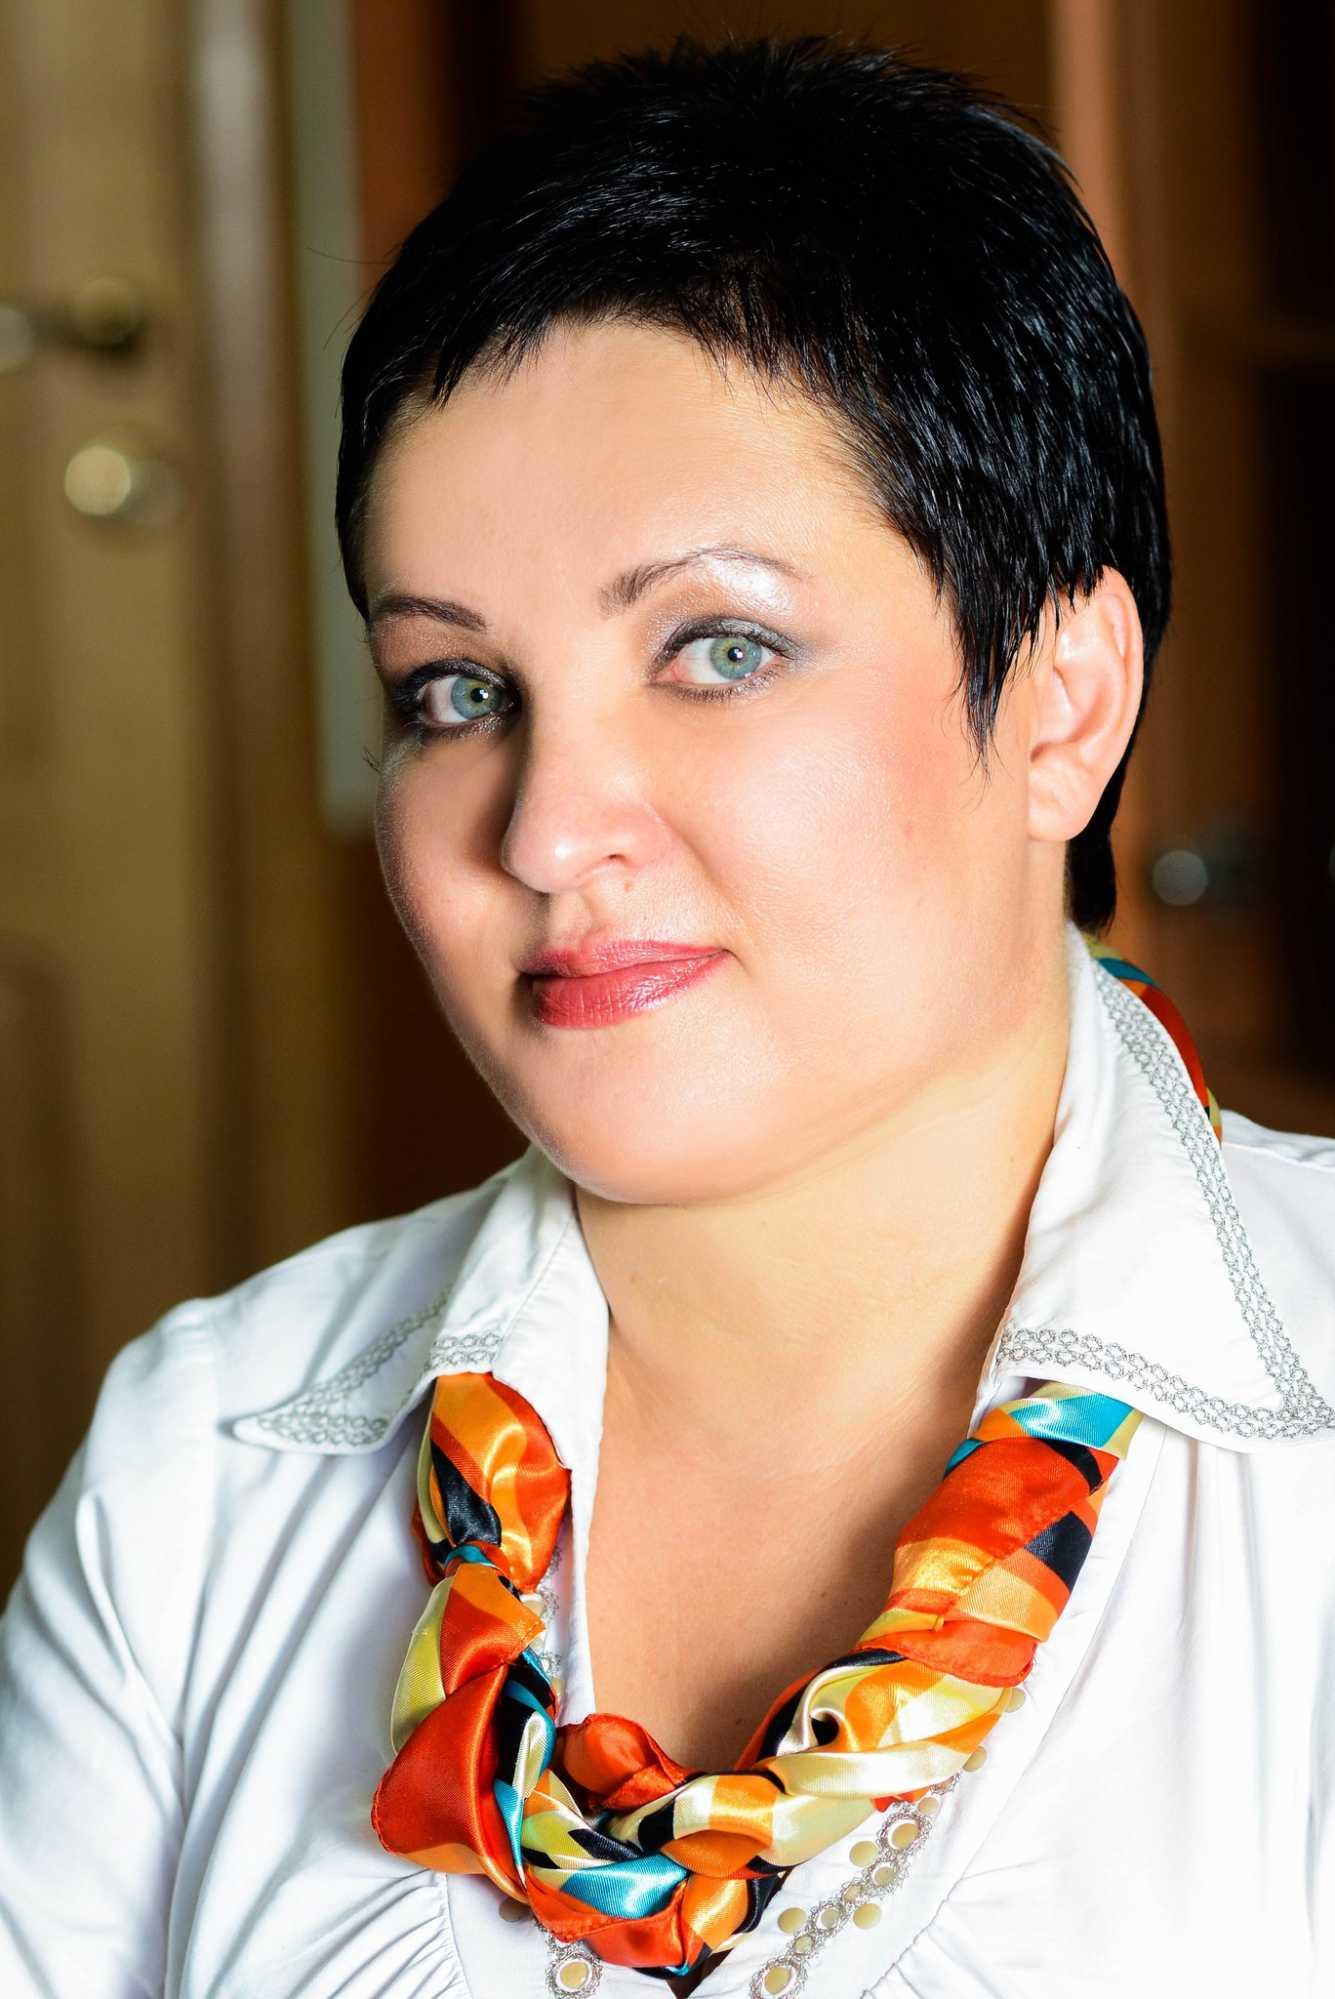 Гарник Олена Анатоліївна